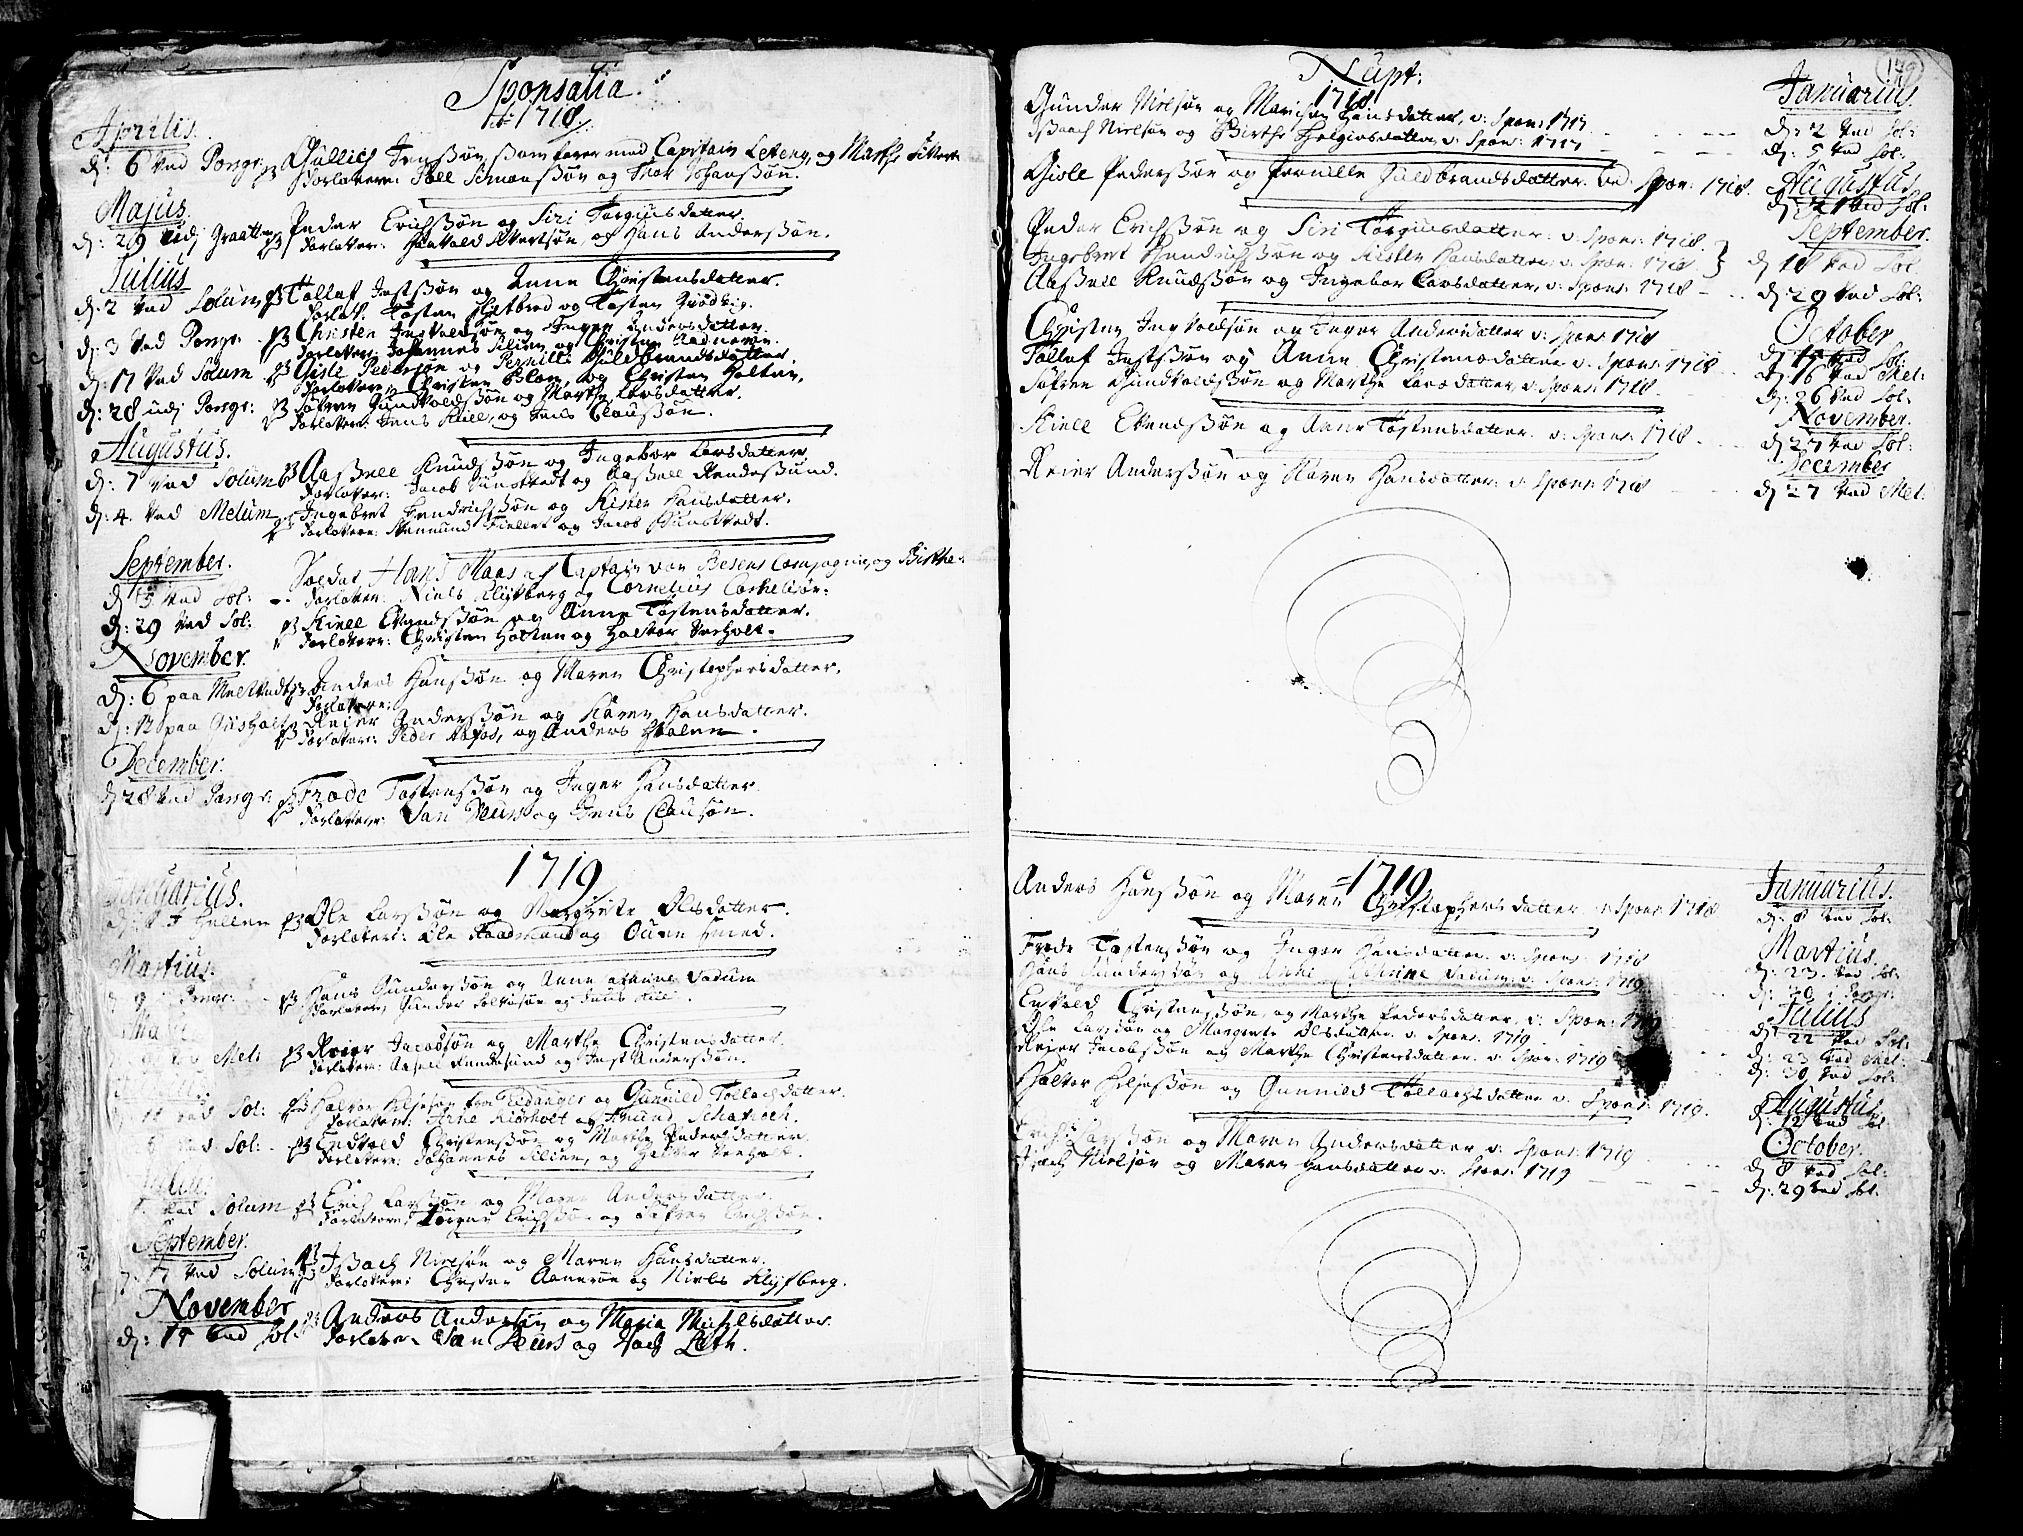 SAKO, Solum kirkebøker, F/Fa/L0002: Ministerialbok nr. I 2, 1713-1761, s. 179